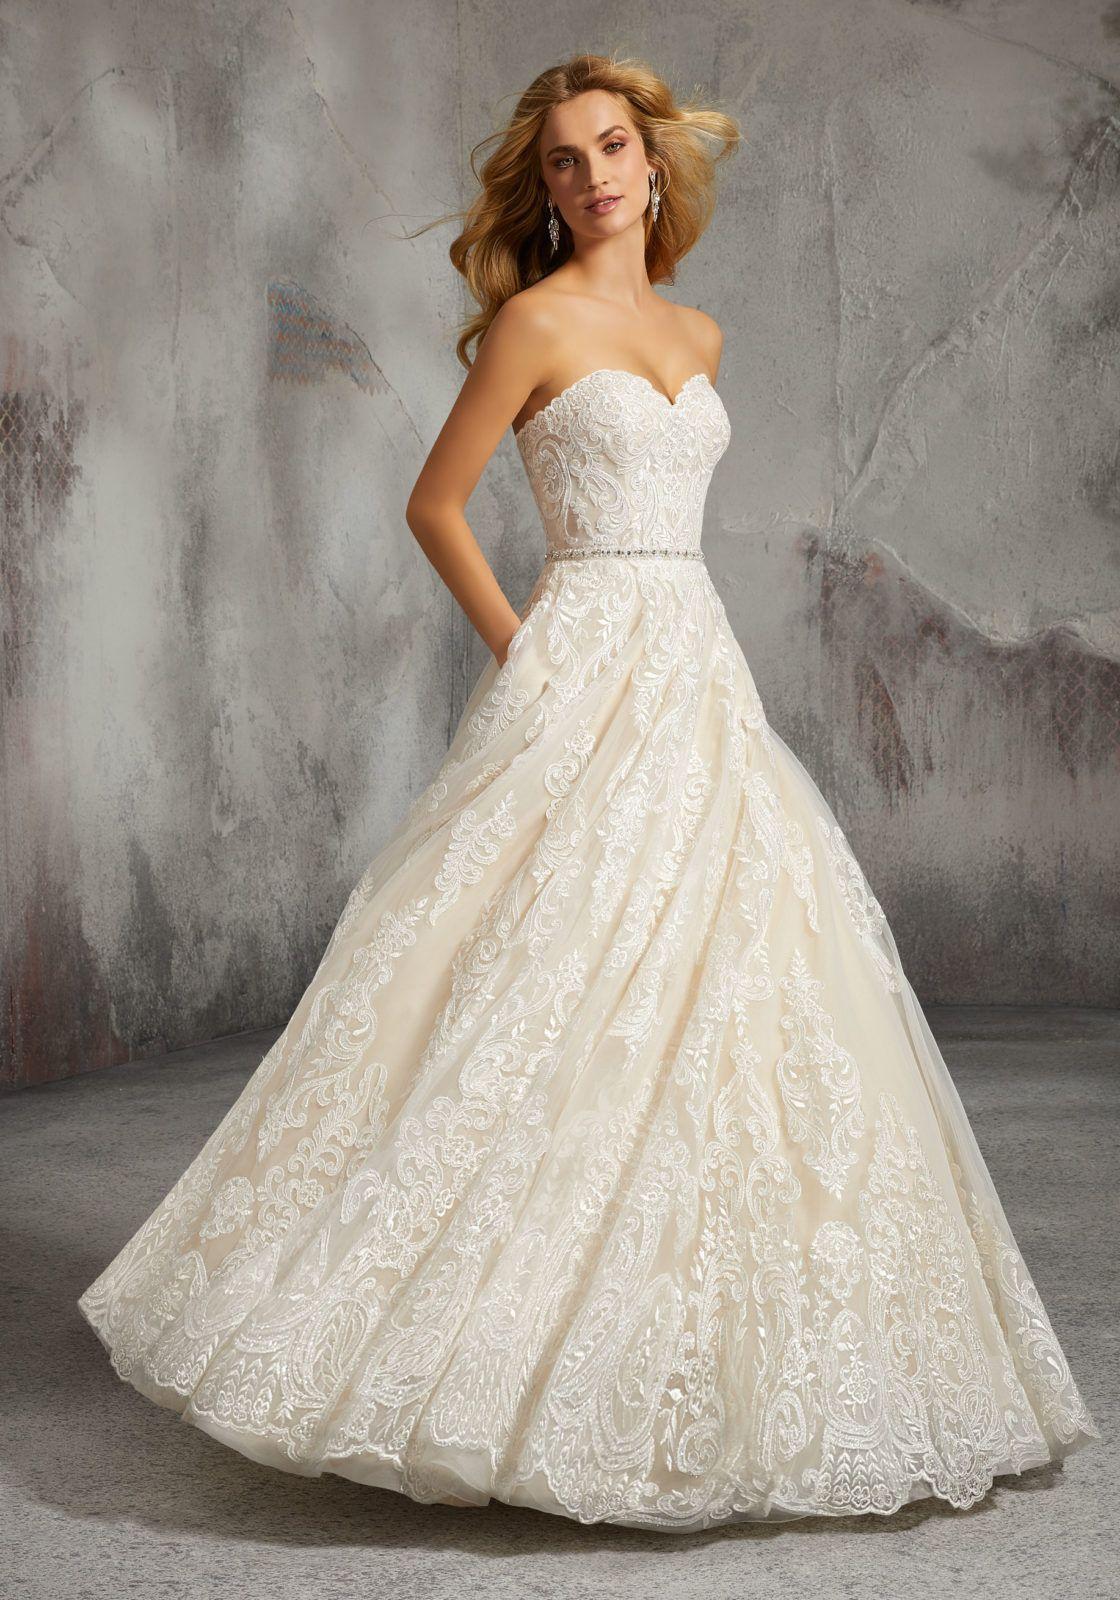 Lisa Wedding Dress Morilee Mori Lee Wedding Dress Ball Gowns Wedding Wedding Dress With Pockets